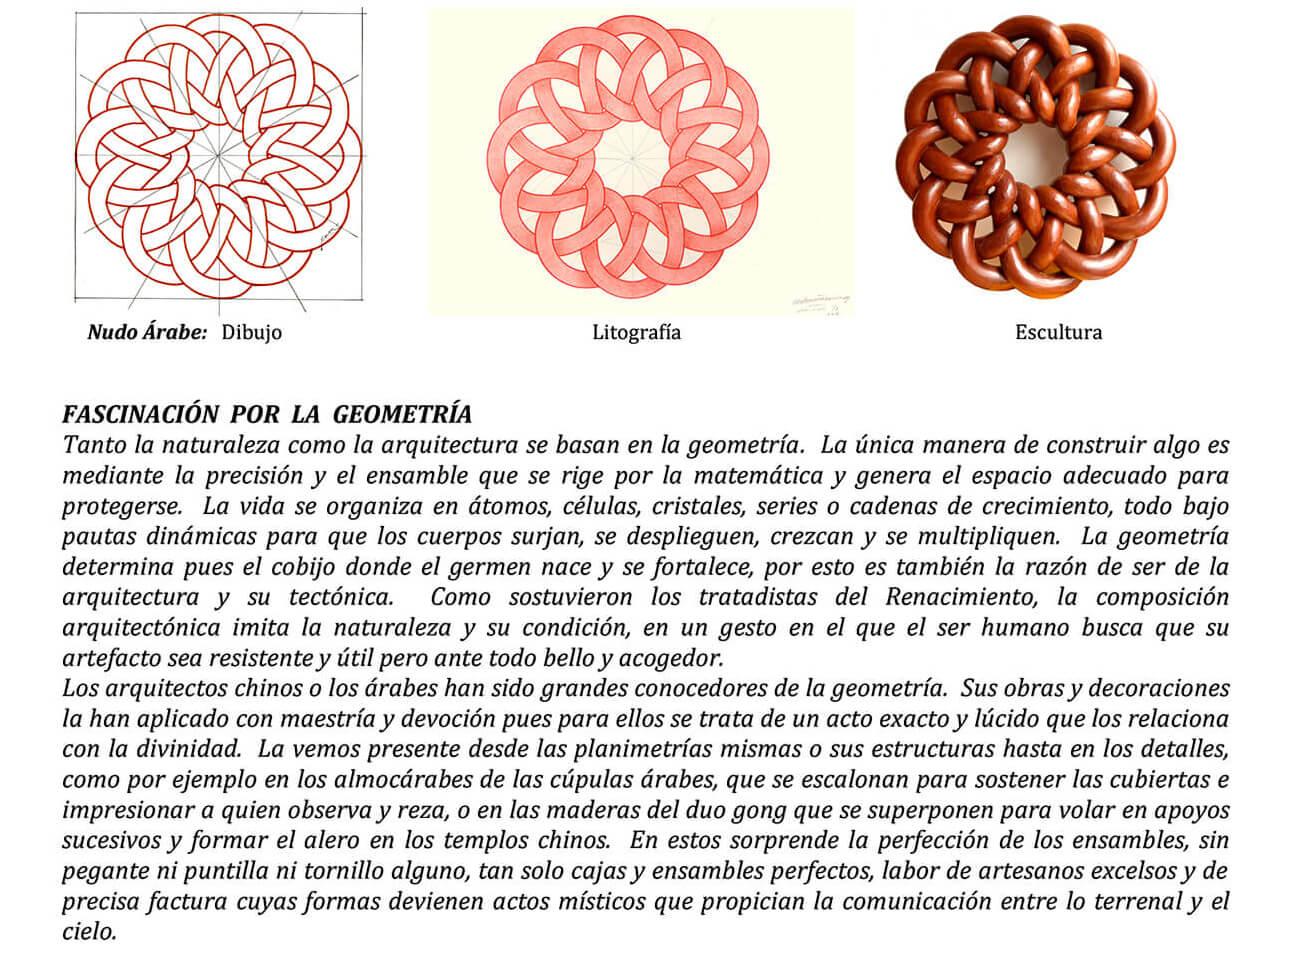 Fascinacion-escultura-1